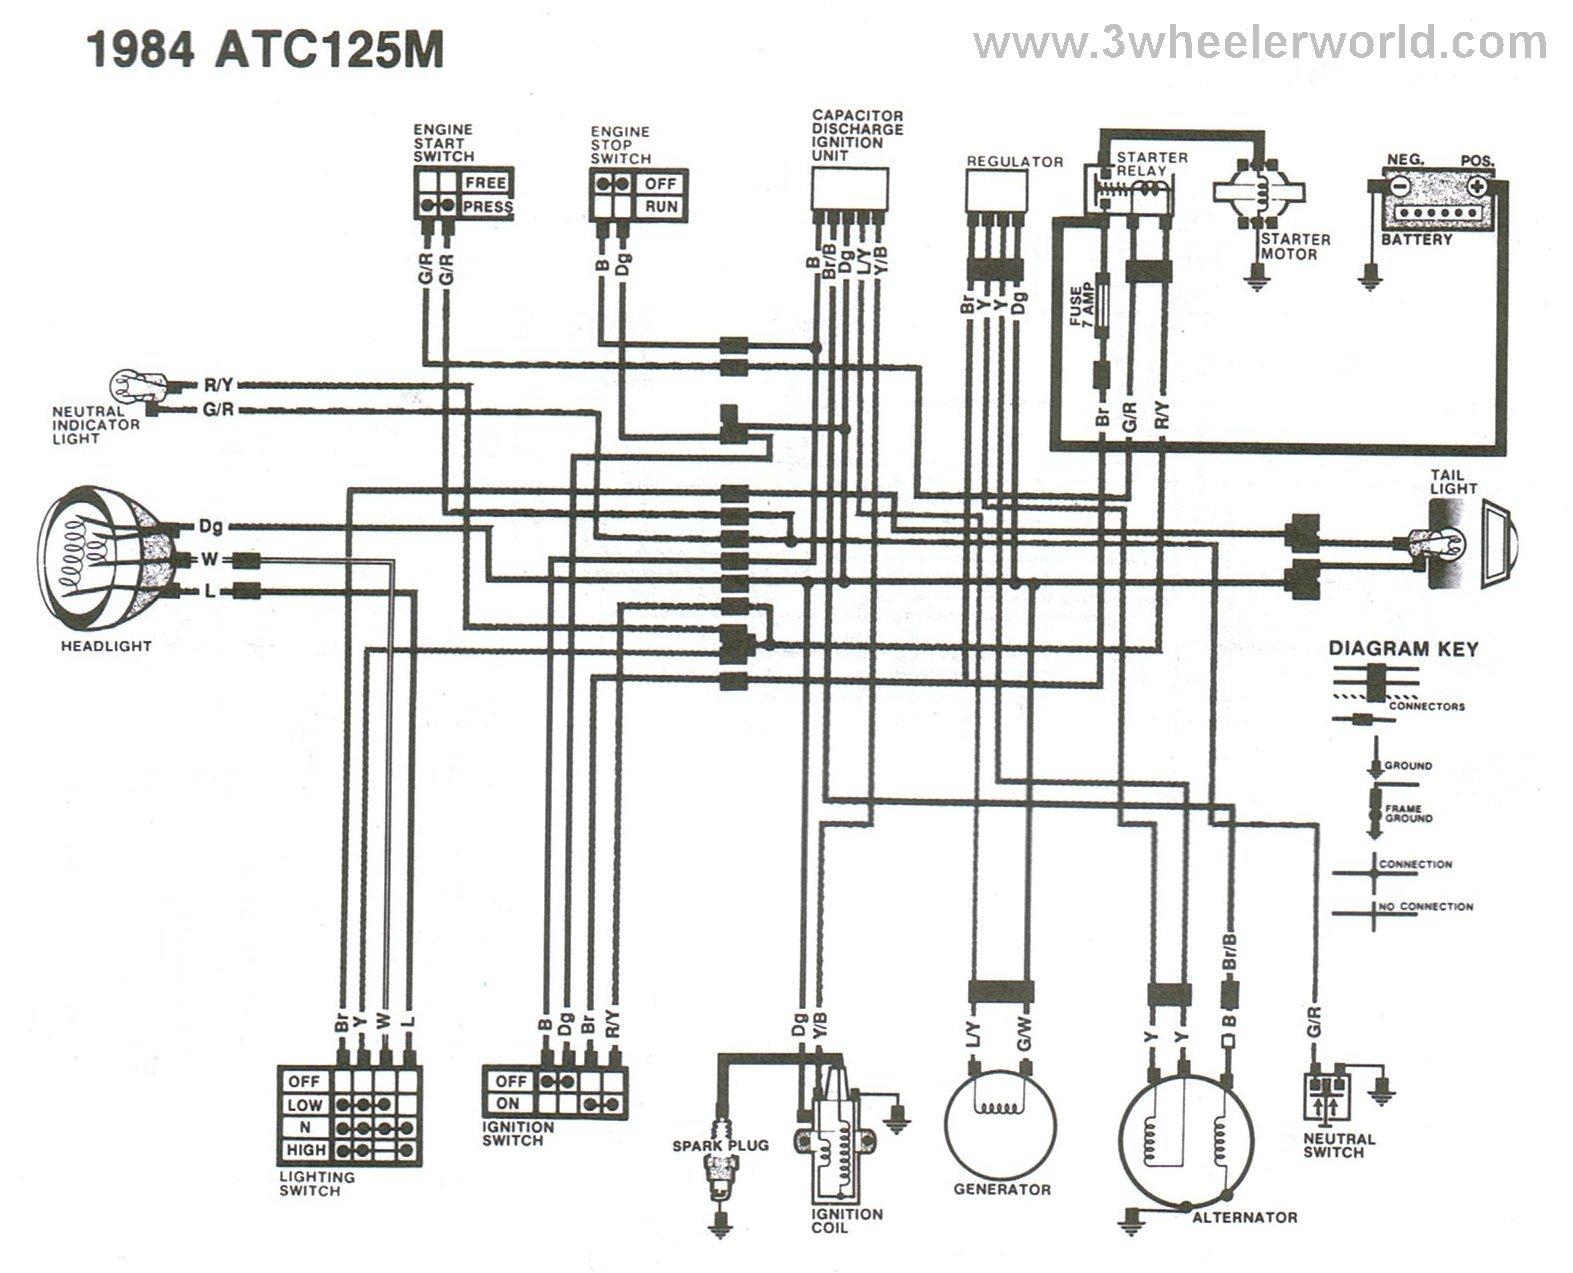 cdi wiring diagram atv cdi image wiring diagram cdi wiring diagram atv wiring diagram on cdi wiring diagram atv